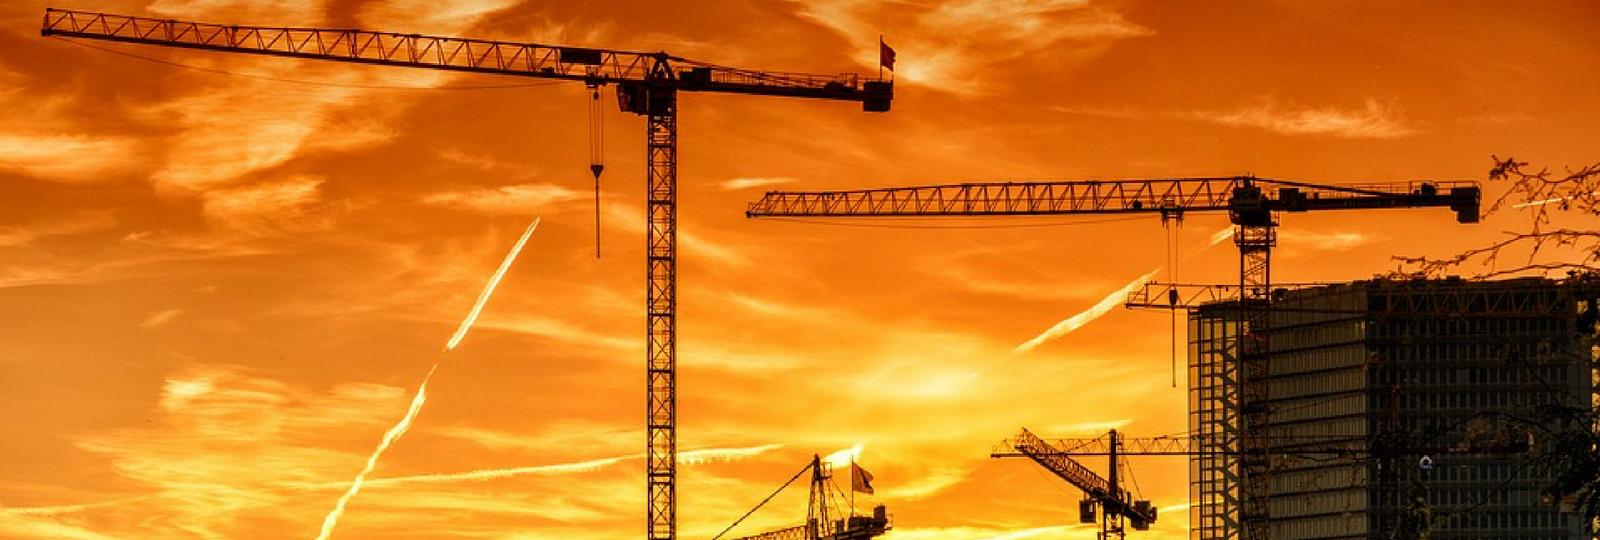 orange sky with cranes construction